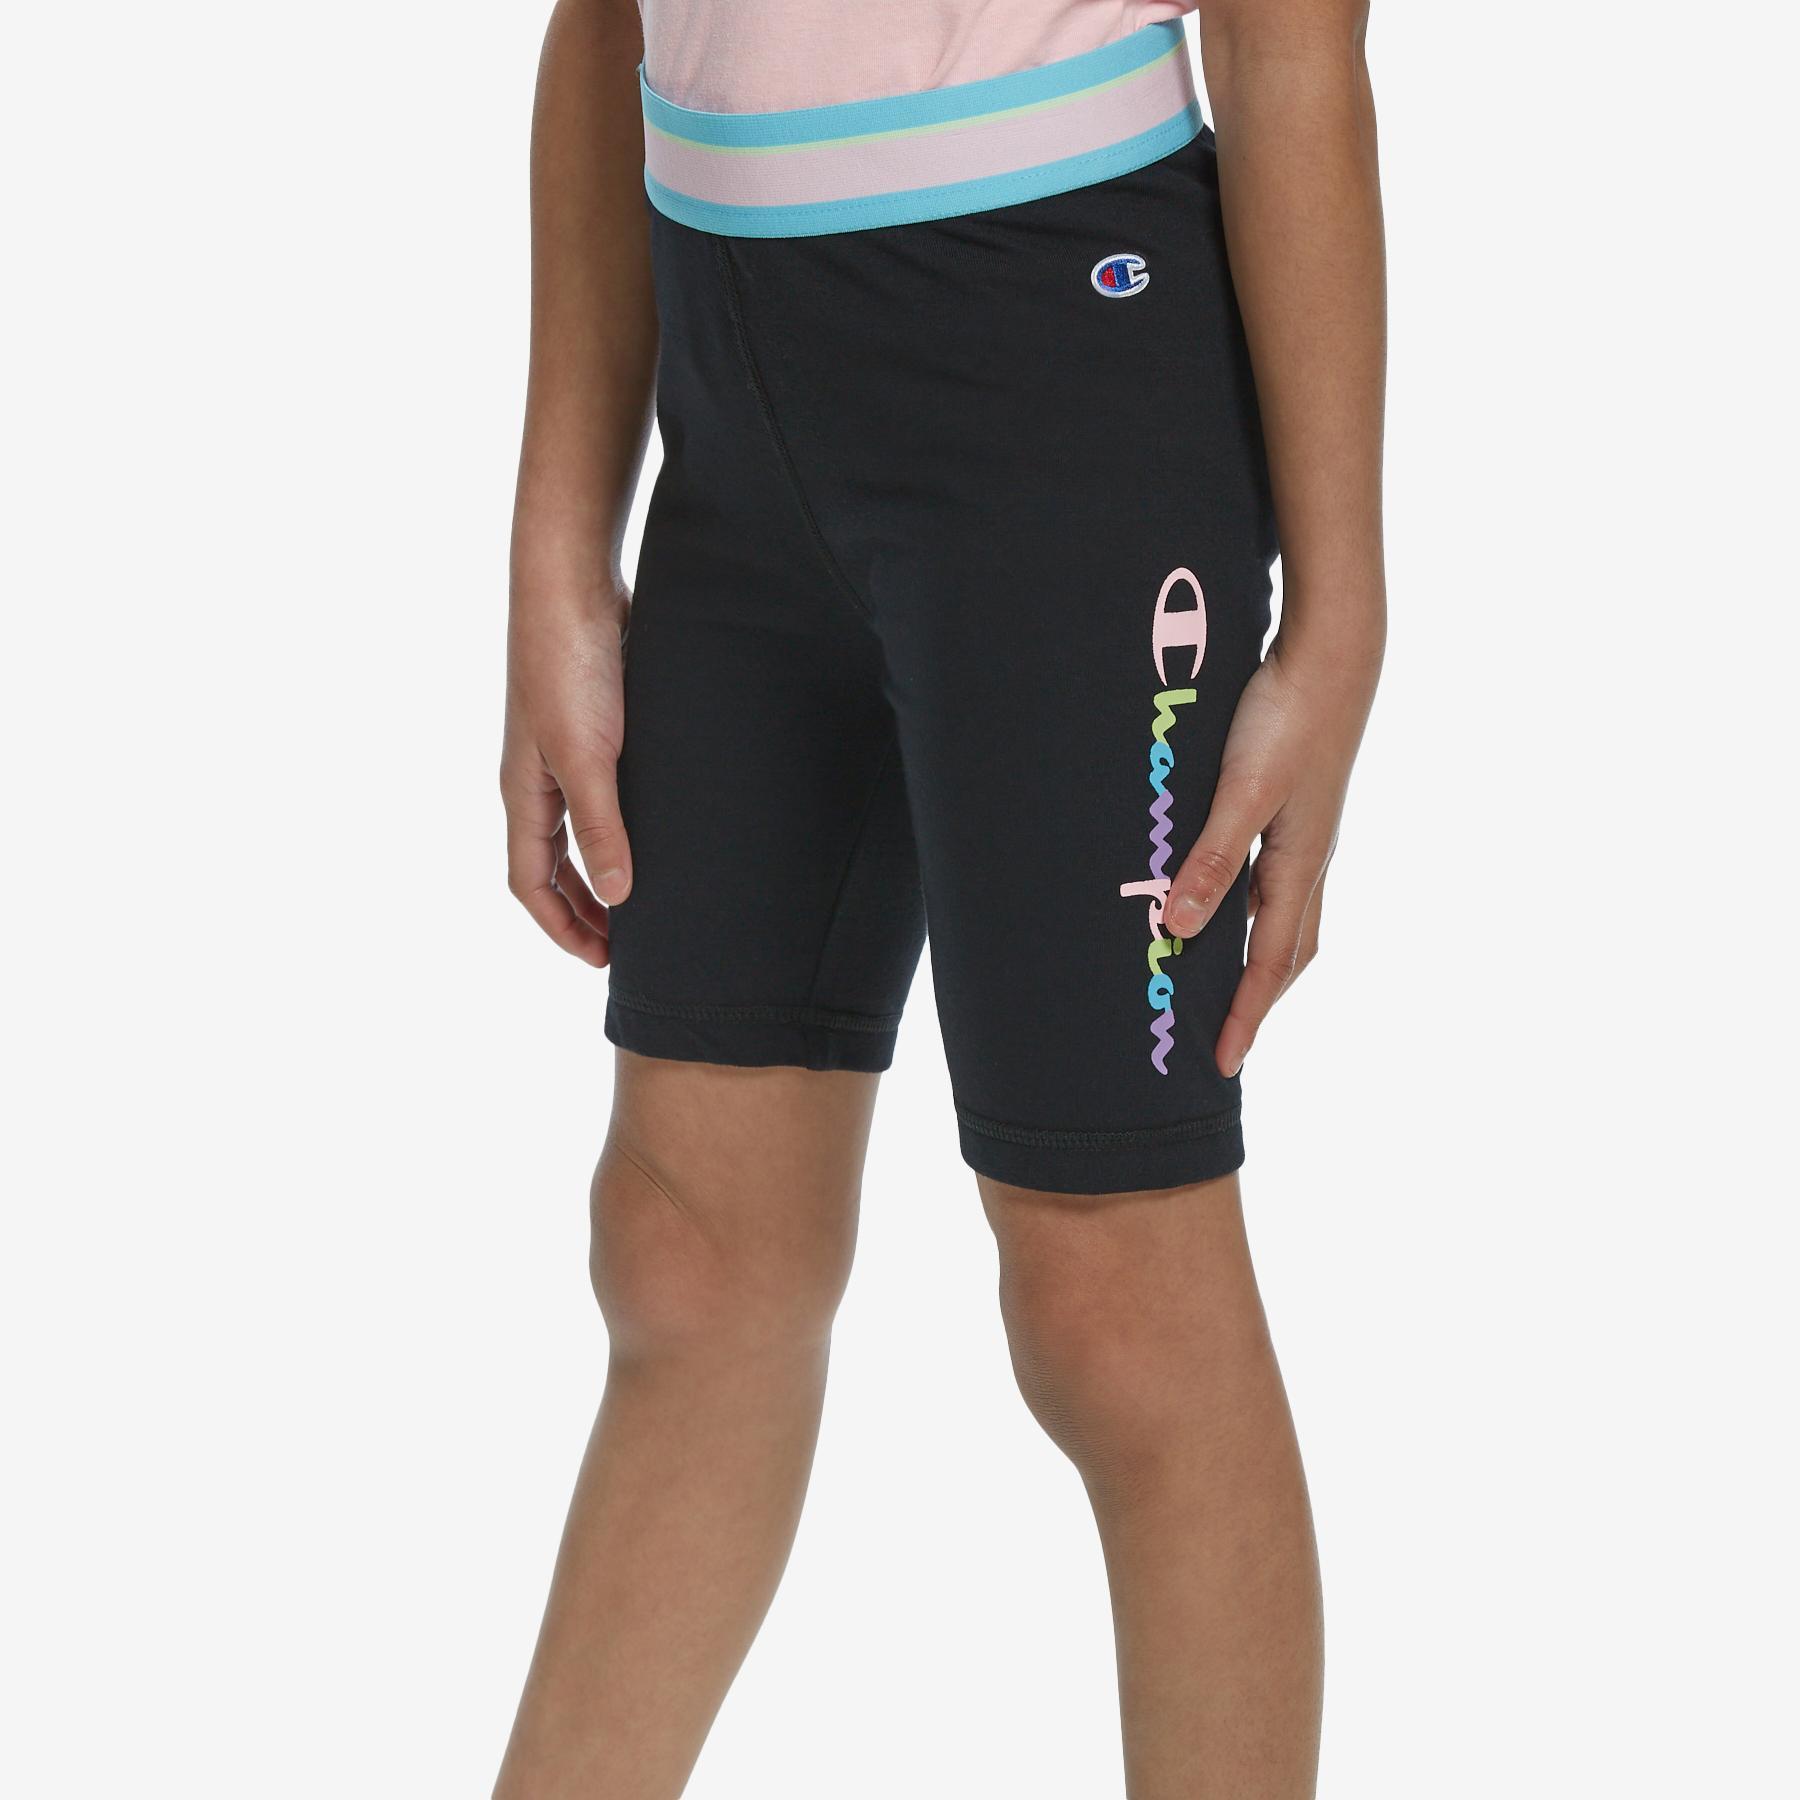 Girl's Banded Bike Shorts